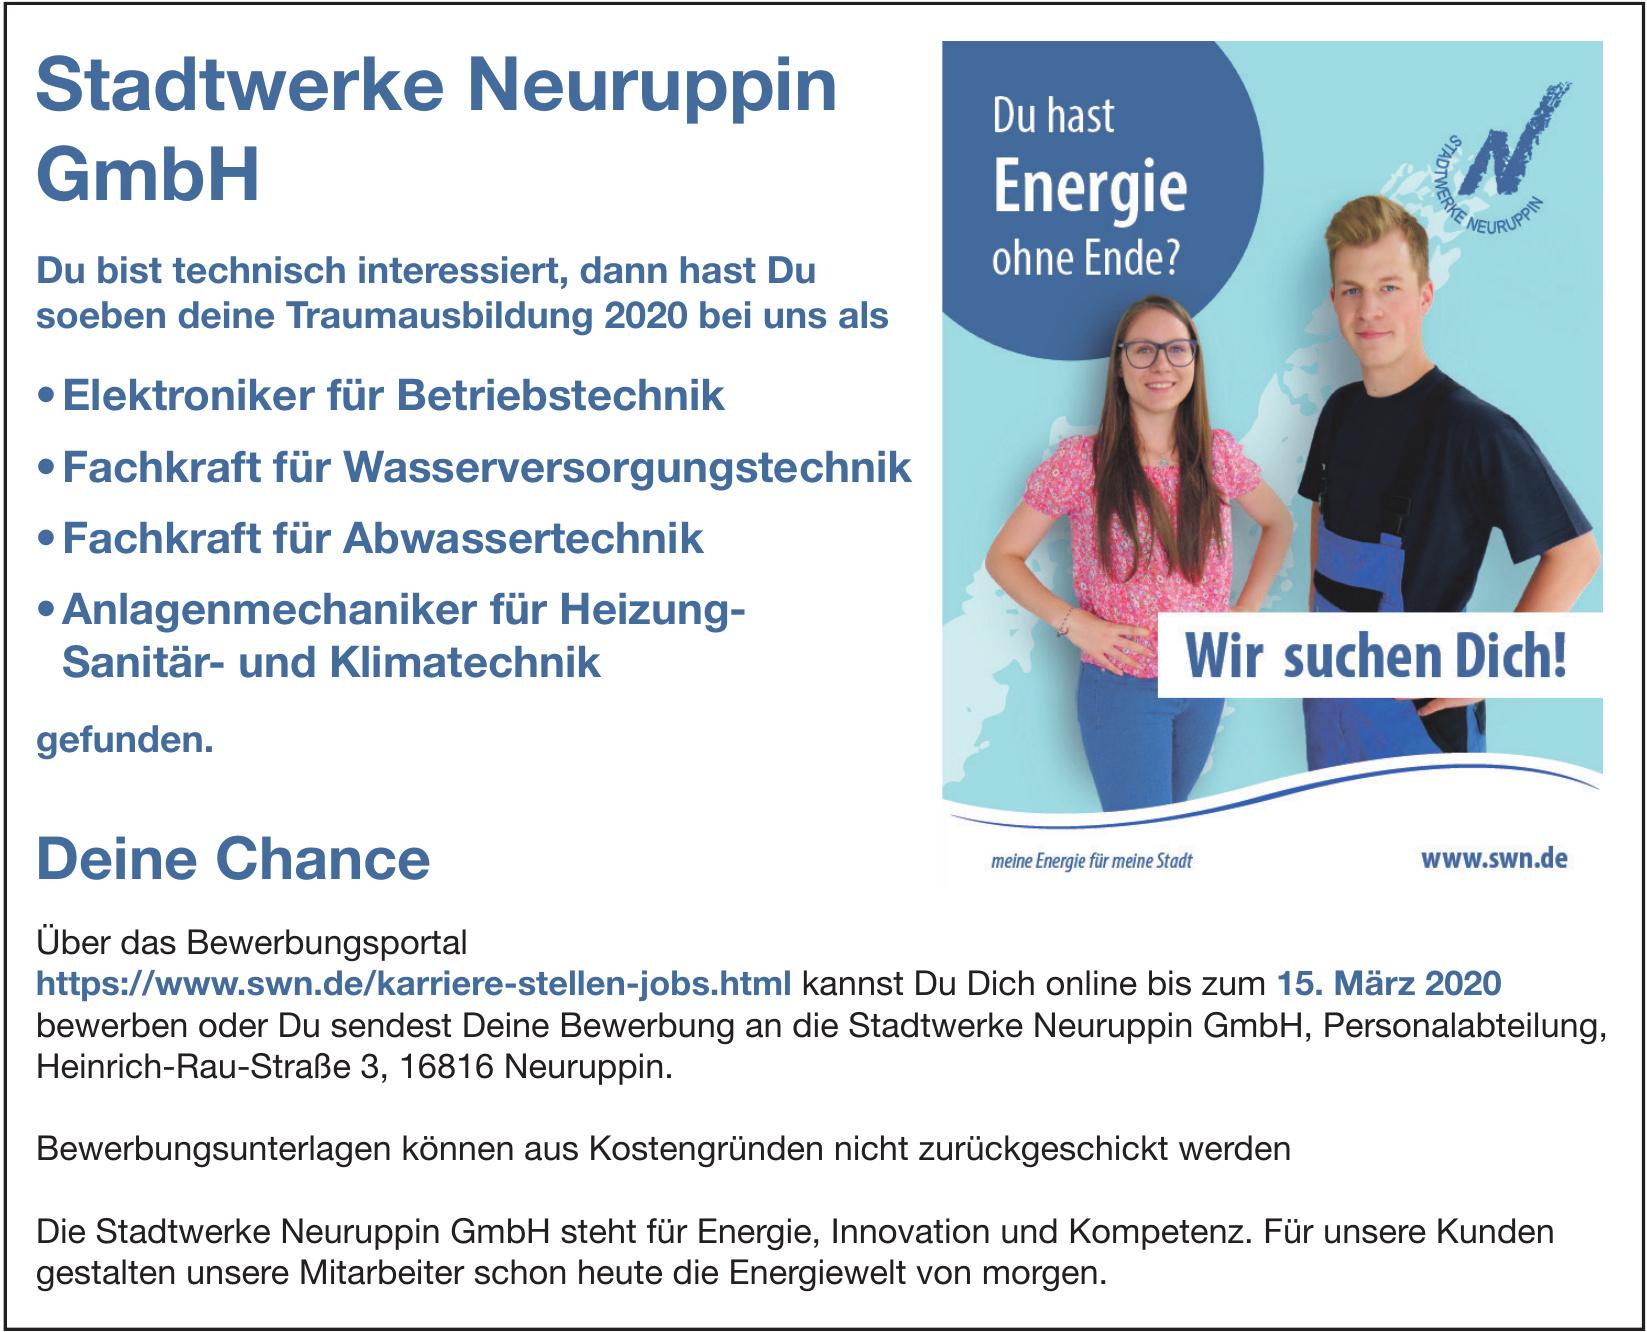 Stadtwerke Neuruppin GmbH